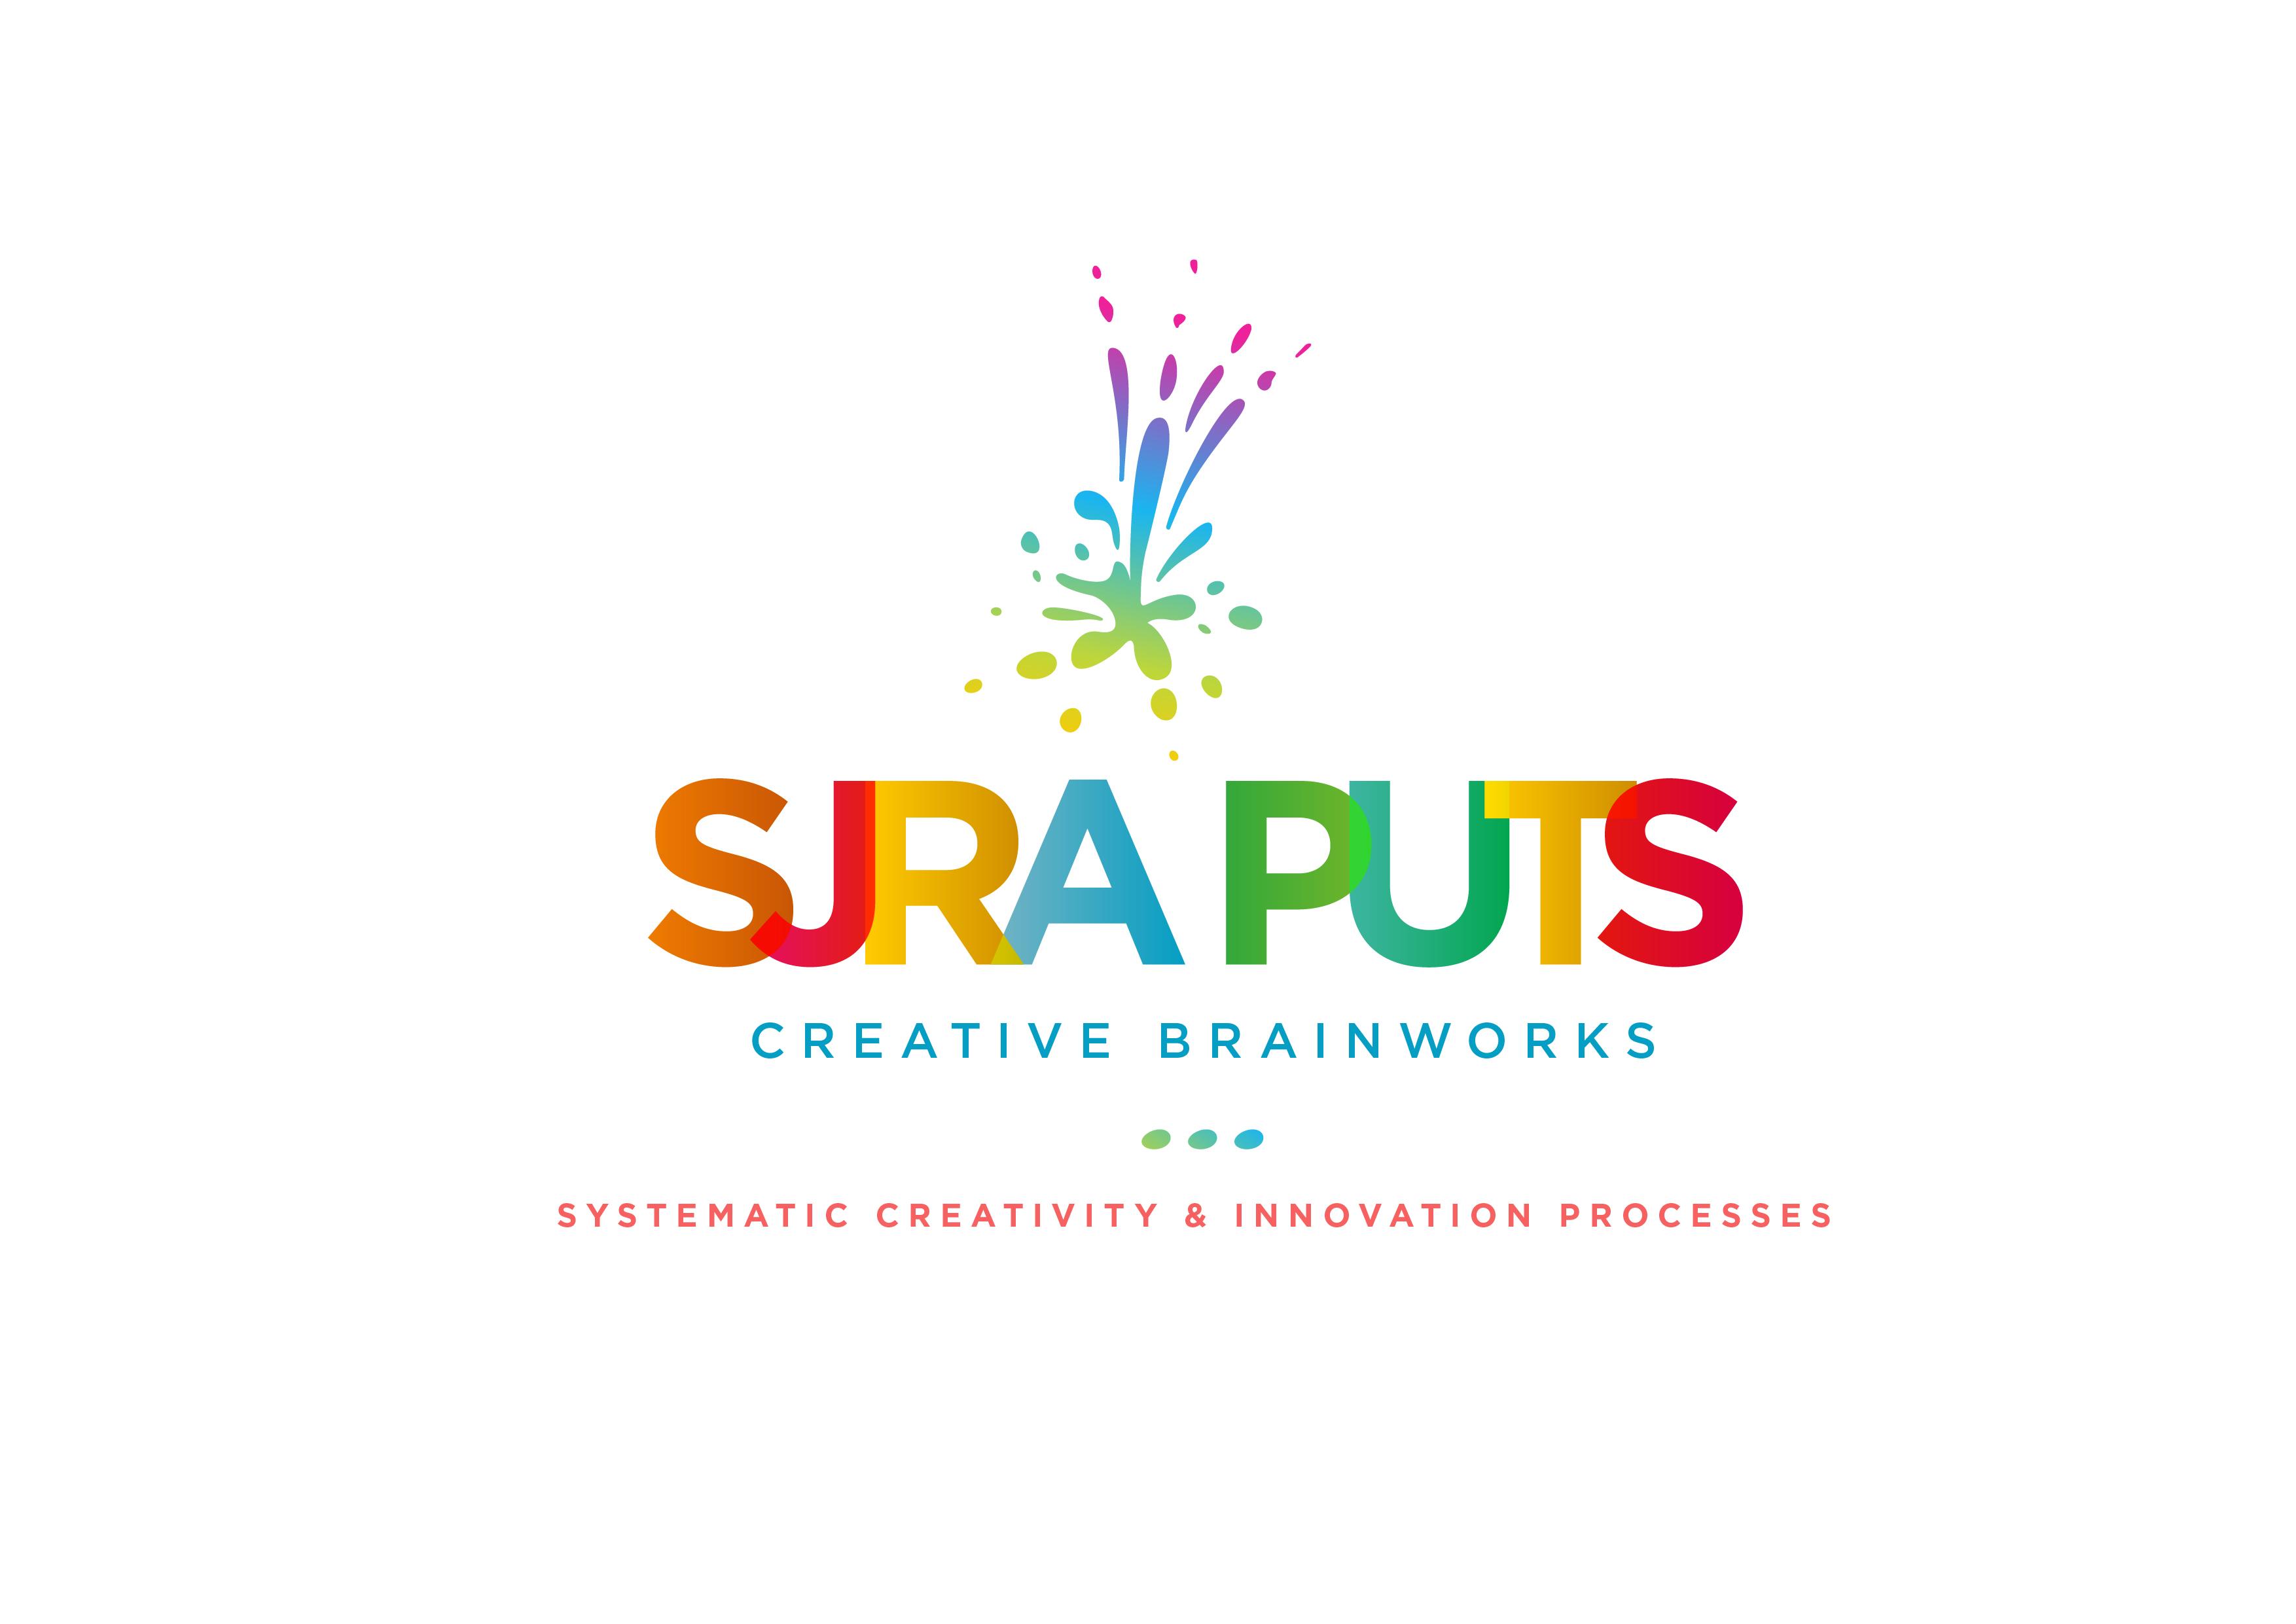 Sjra Puts Creative Brainworks